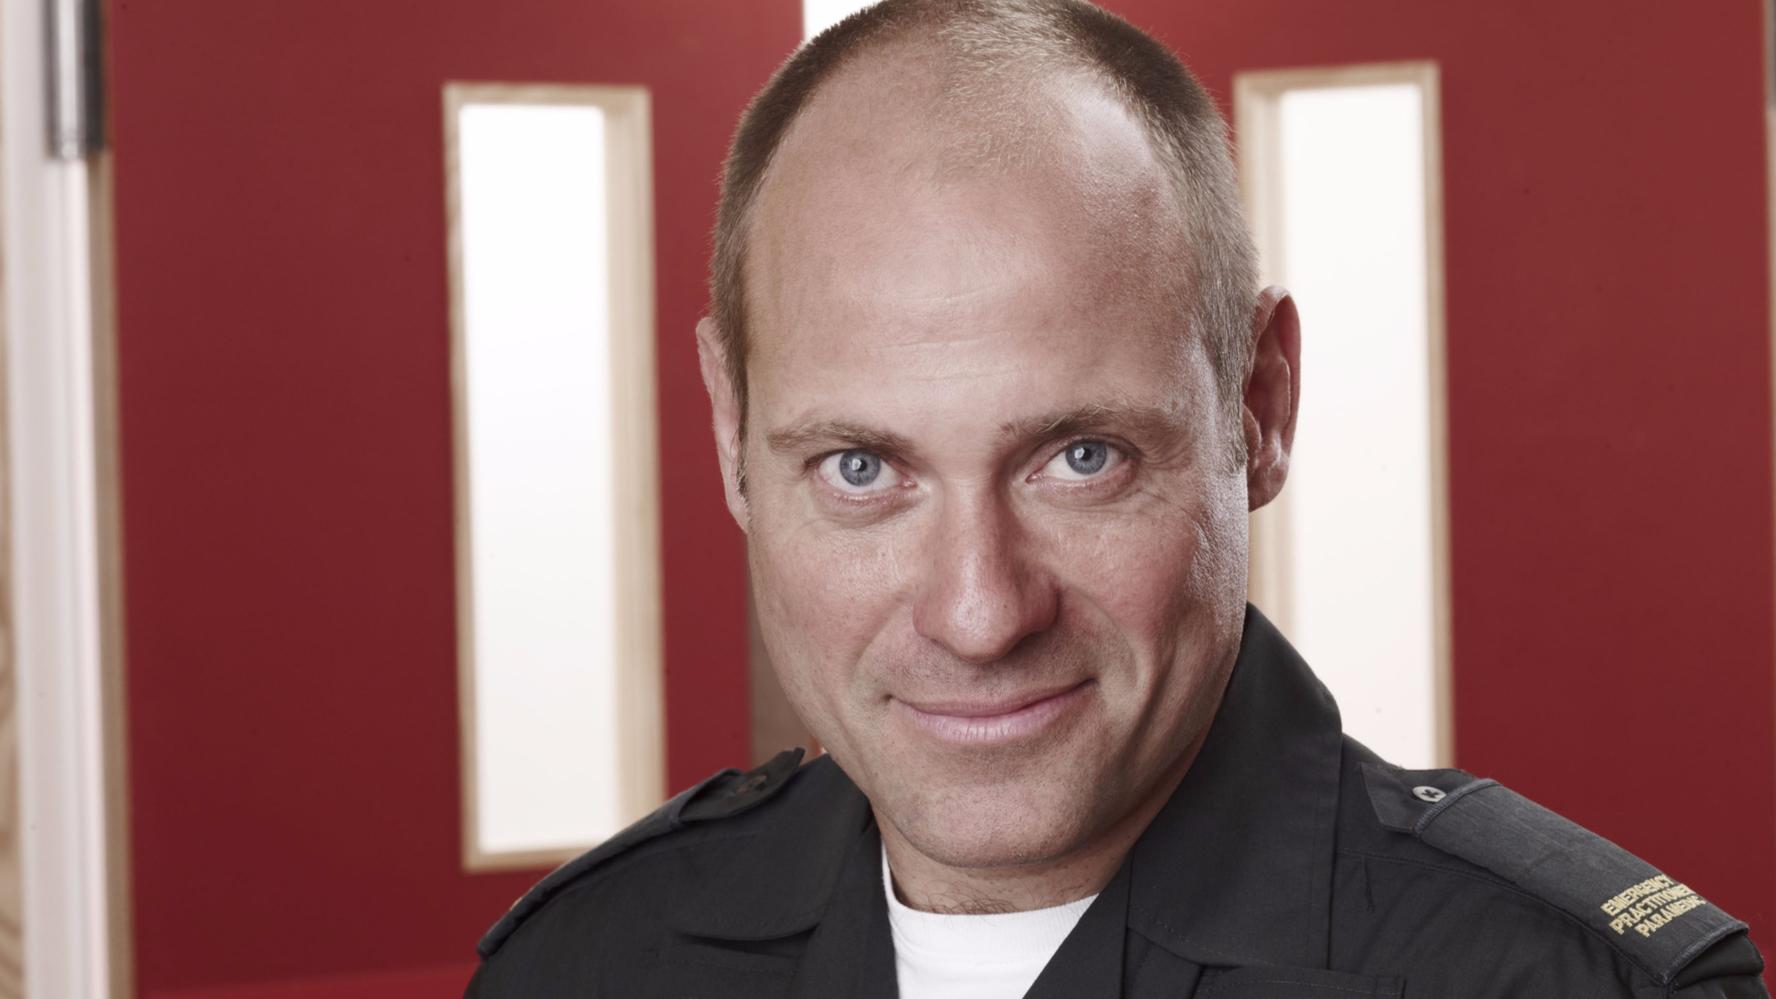 Matt Bardock (born 1969)